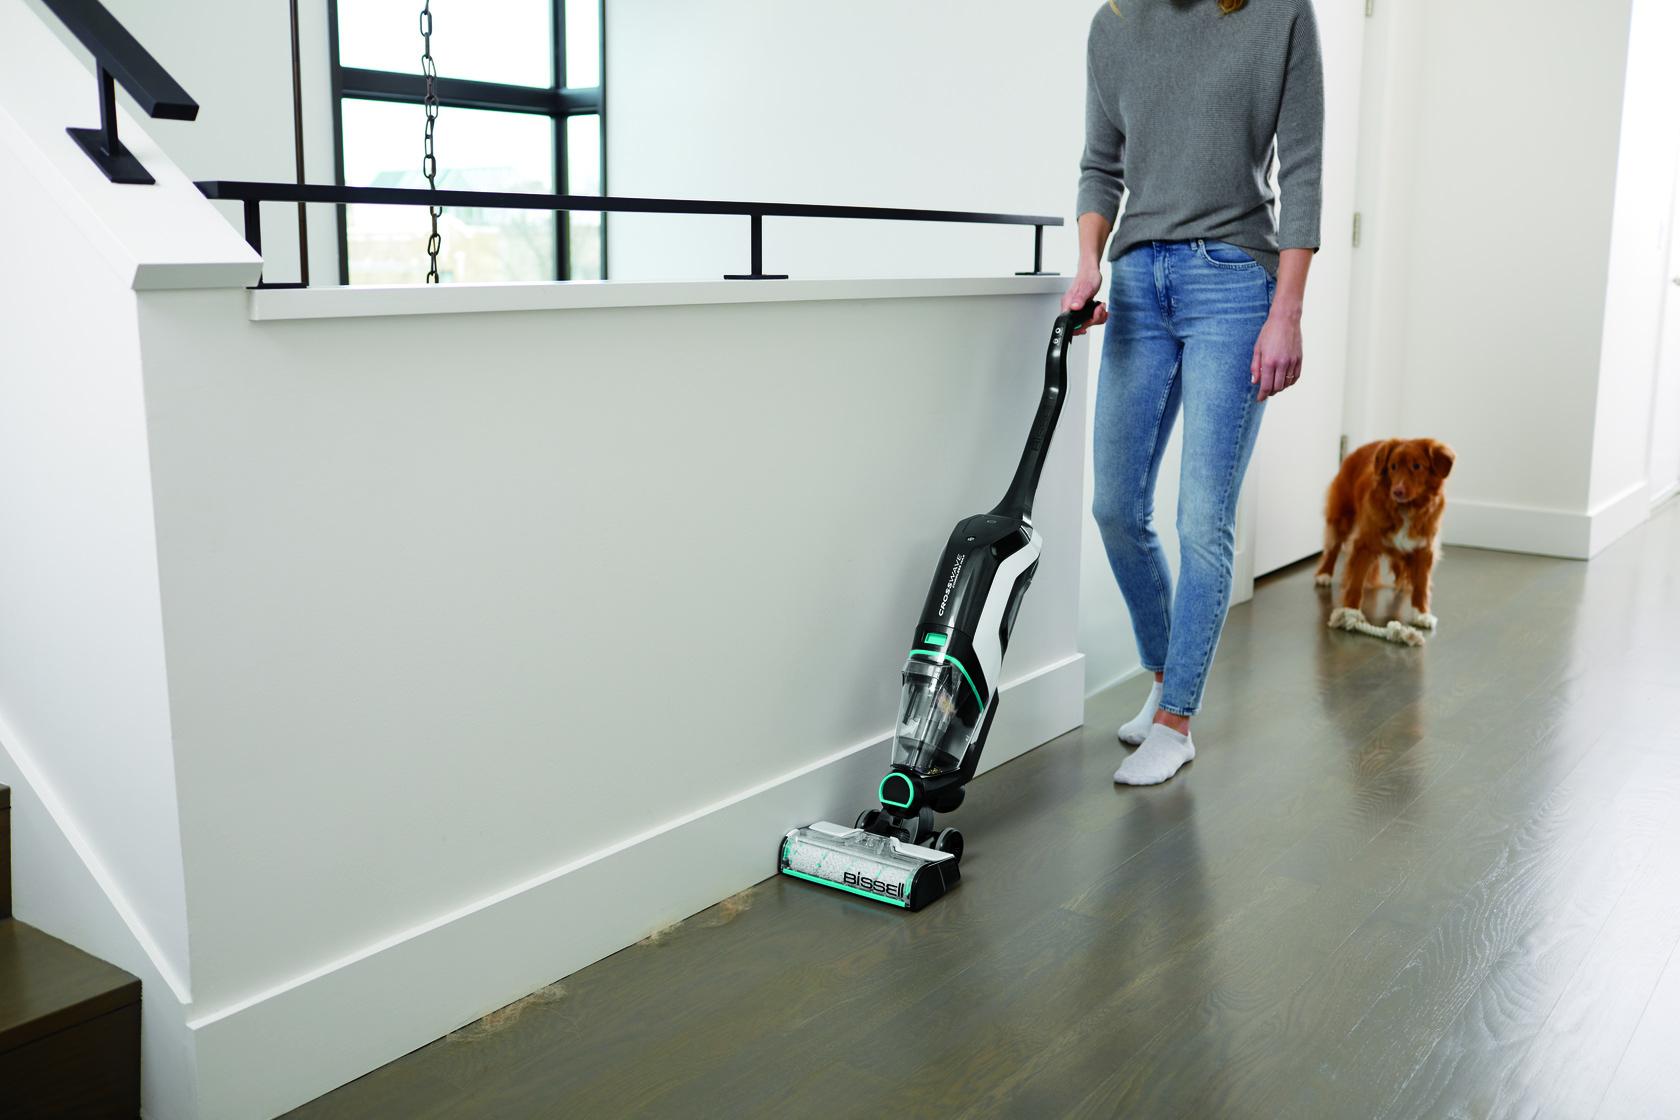 Get the BISSEL CrossWave Cordless Max Wet/dry Vacuum at #BestBuy #BuyBISSELLSavePets